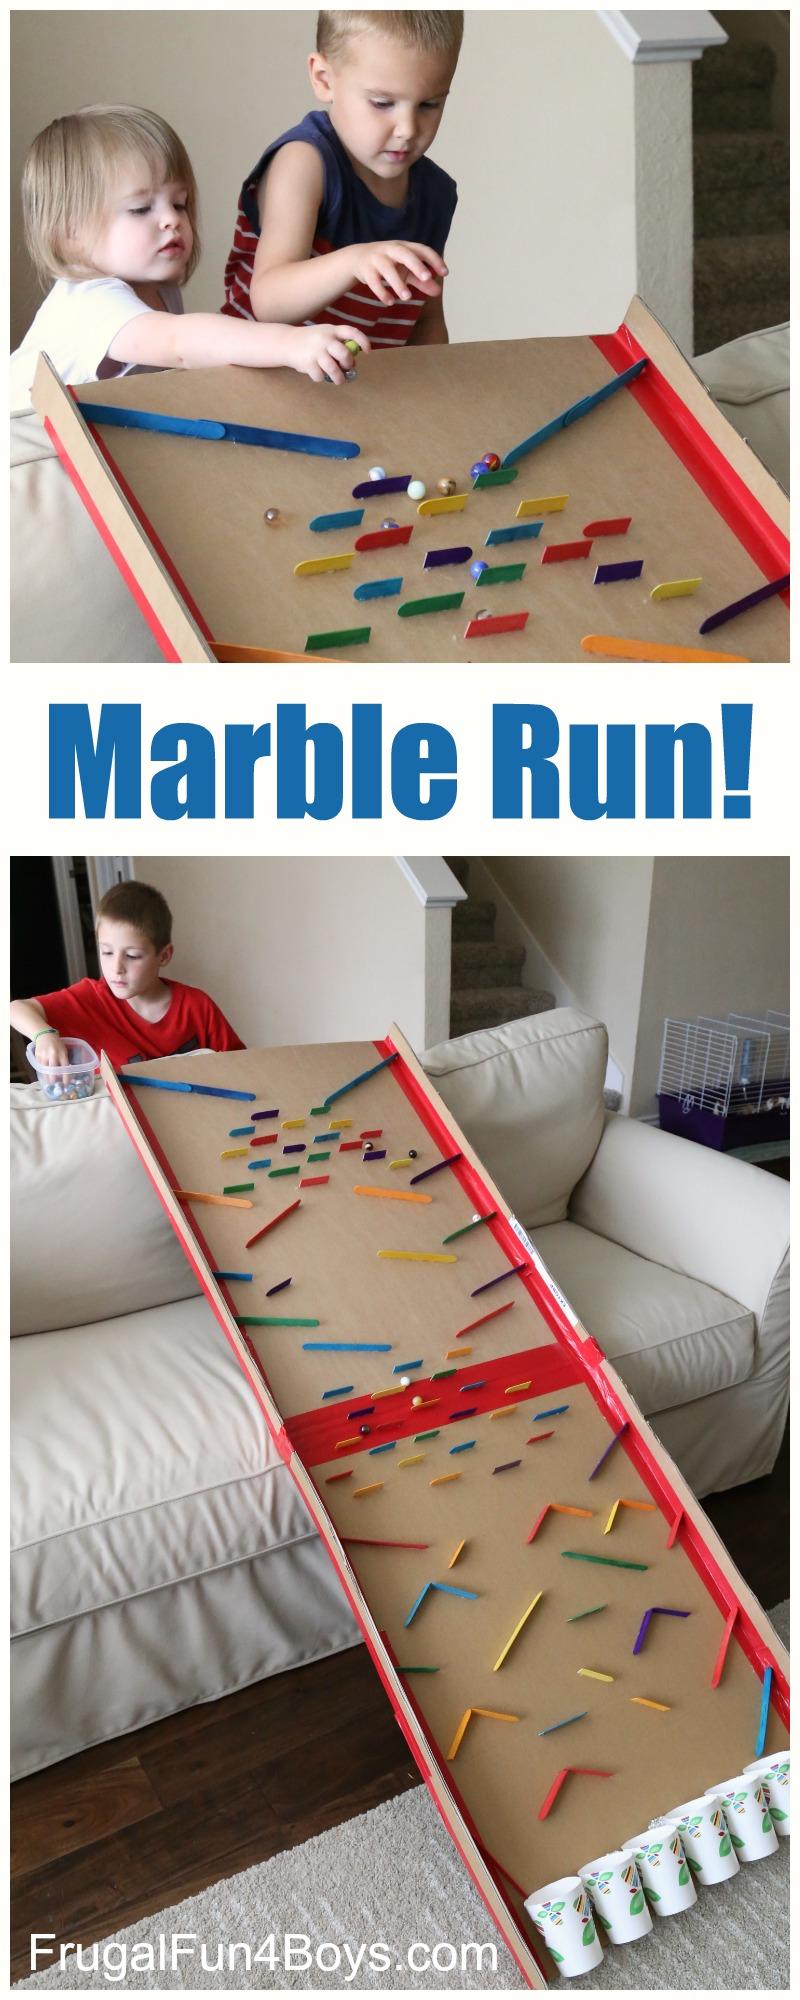 Build an Epic Cardboard Marble Run